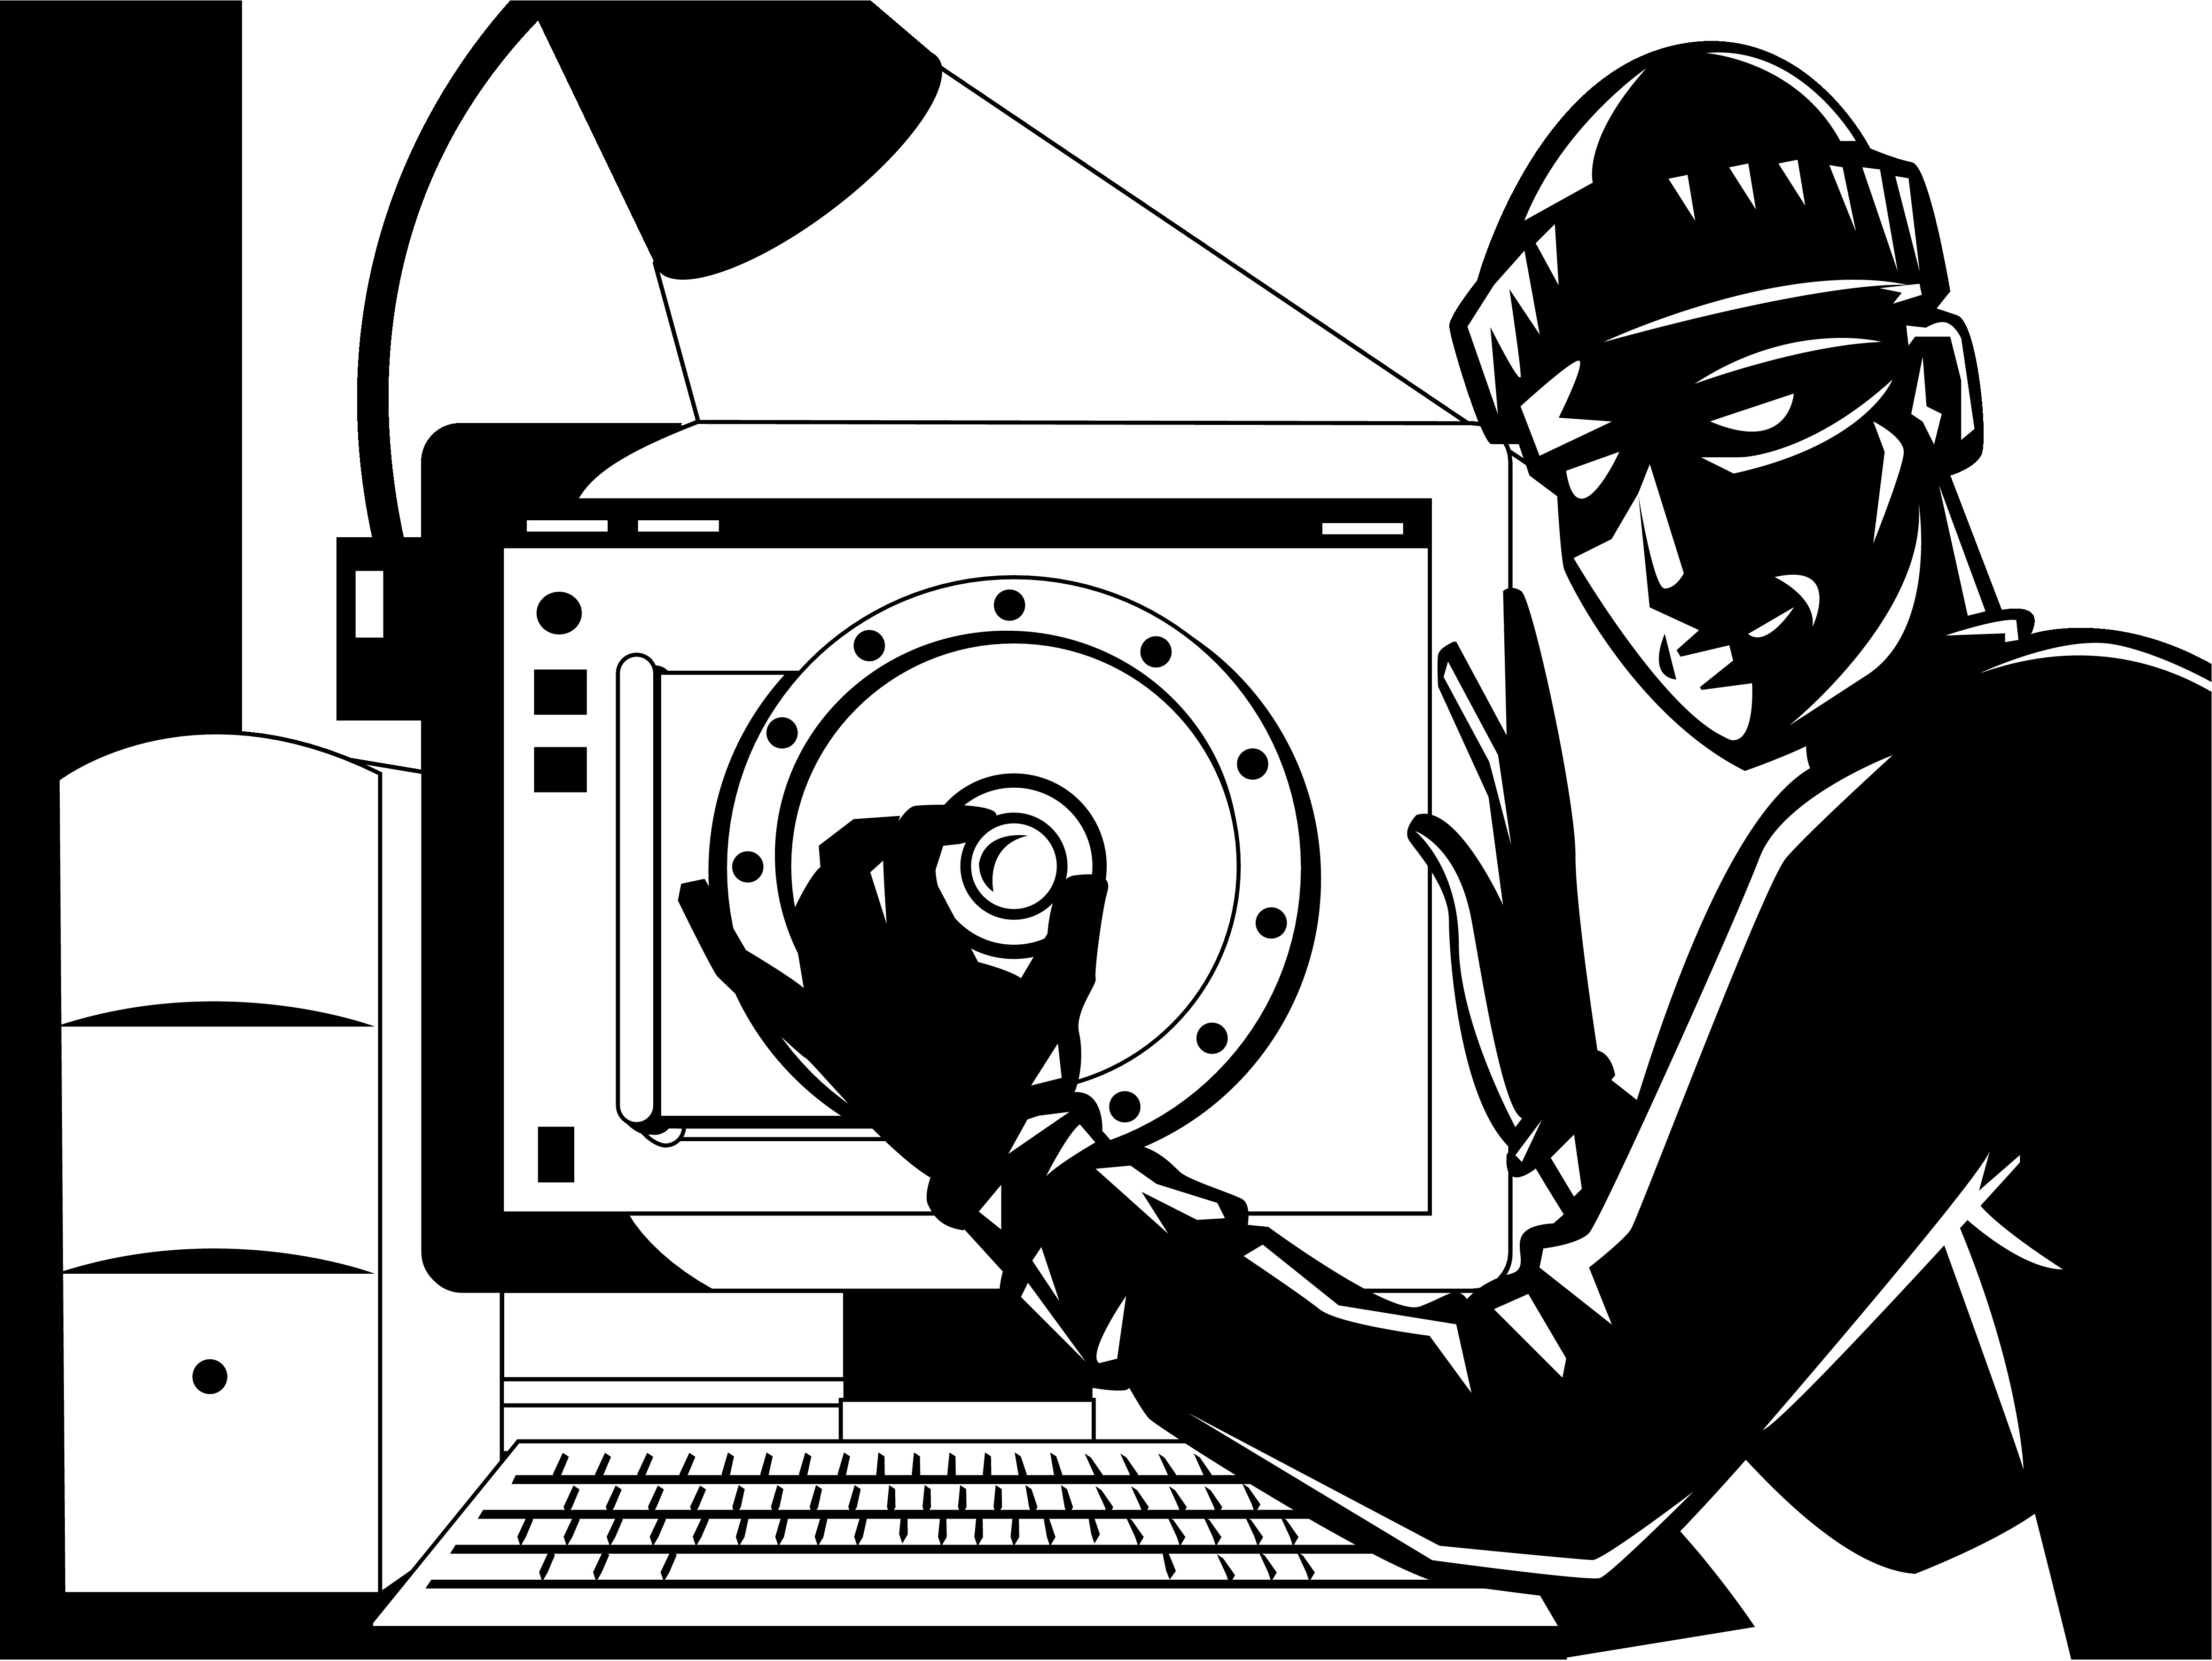 cyber stealing